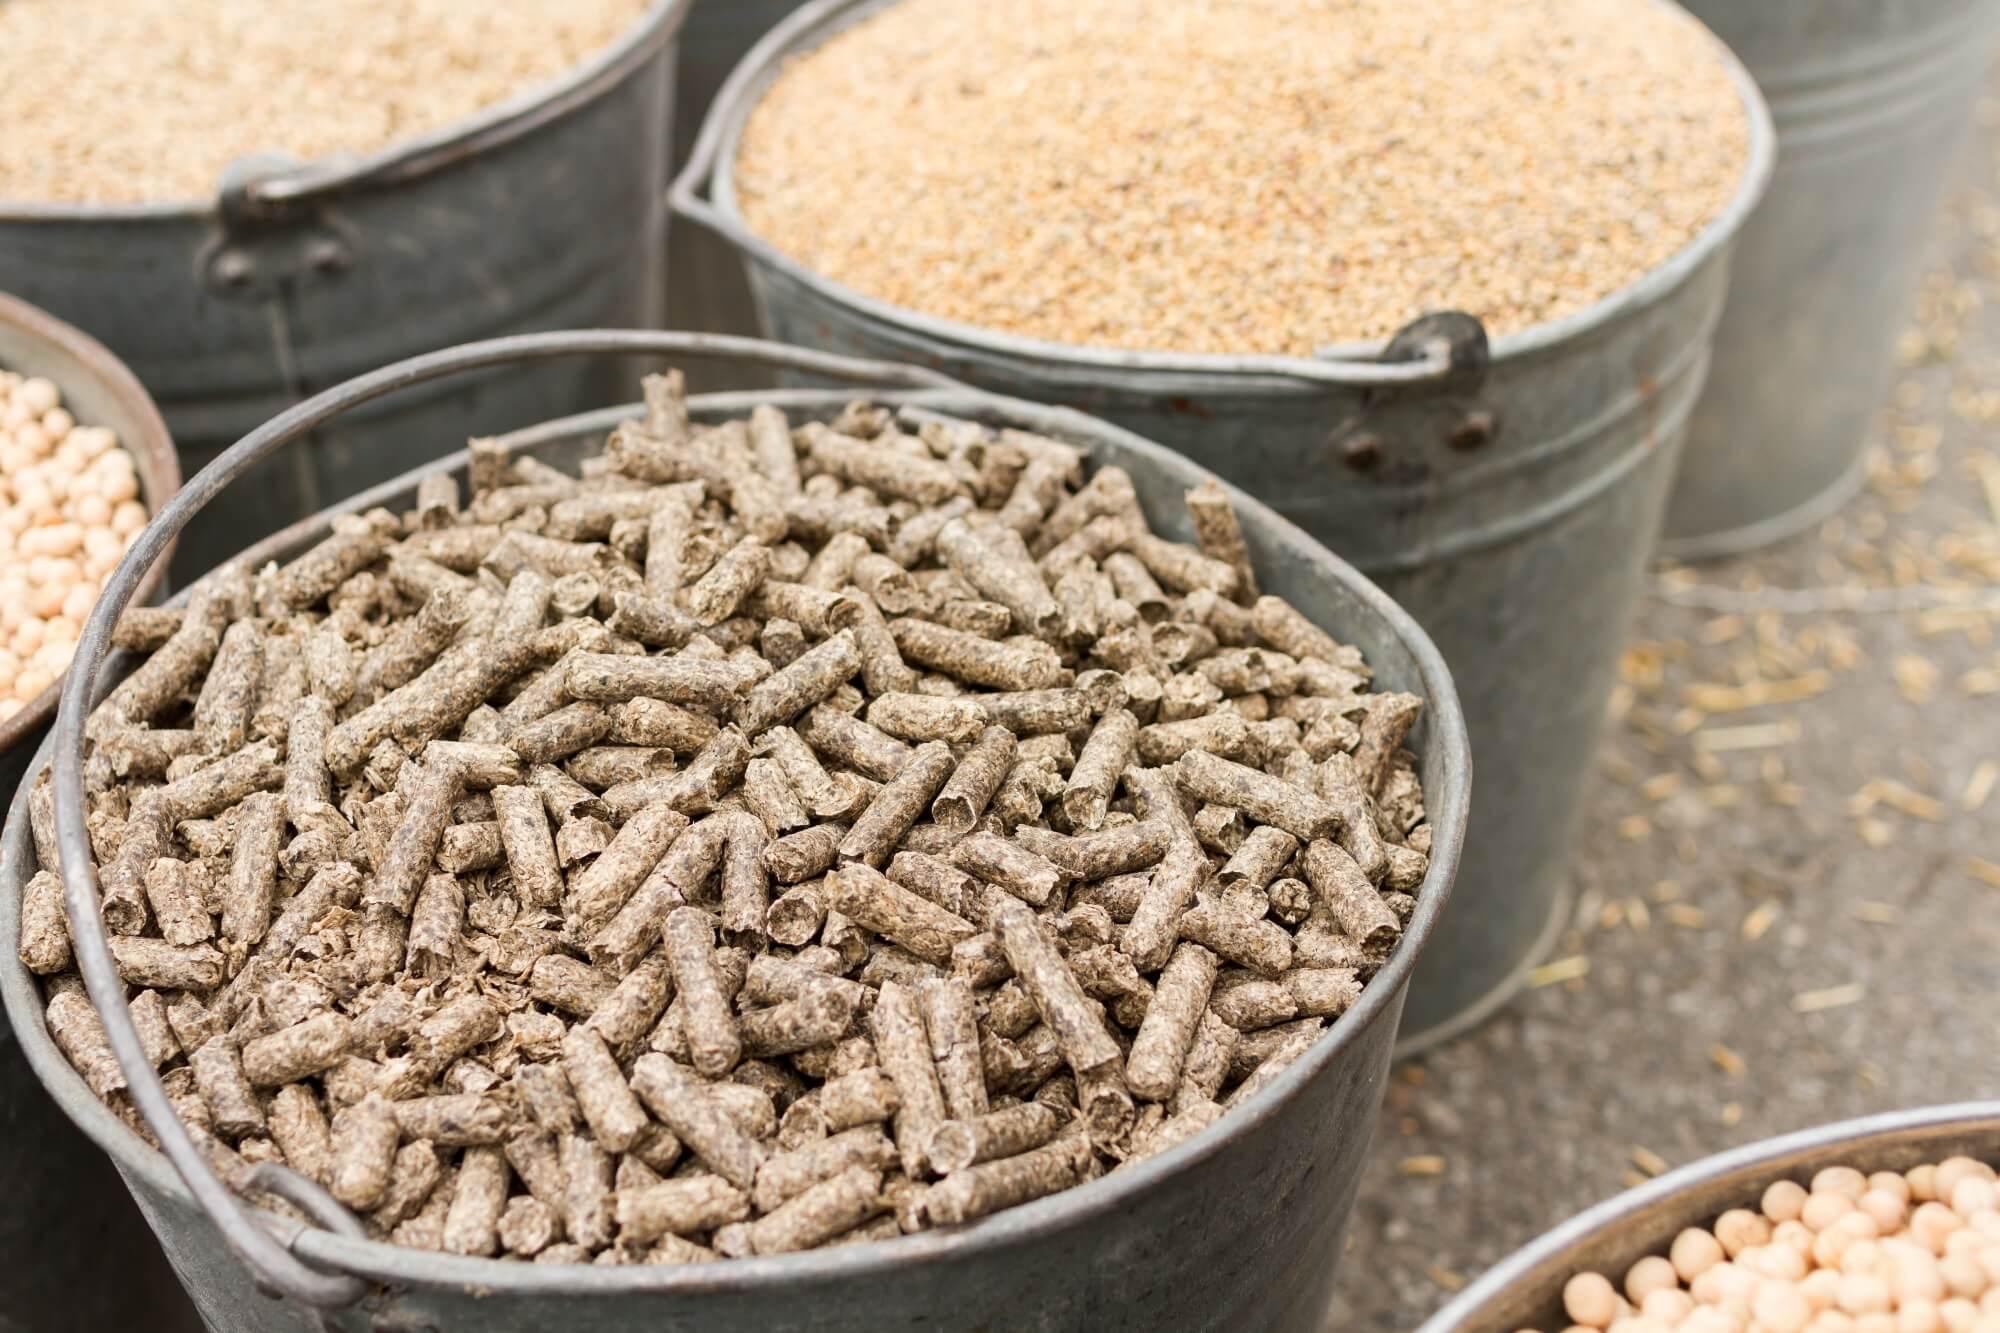 Corngerm meal pellets (Maïskiemschroot / Cornex)